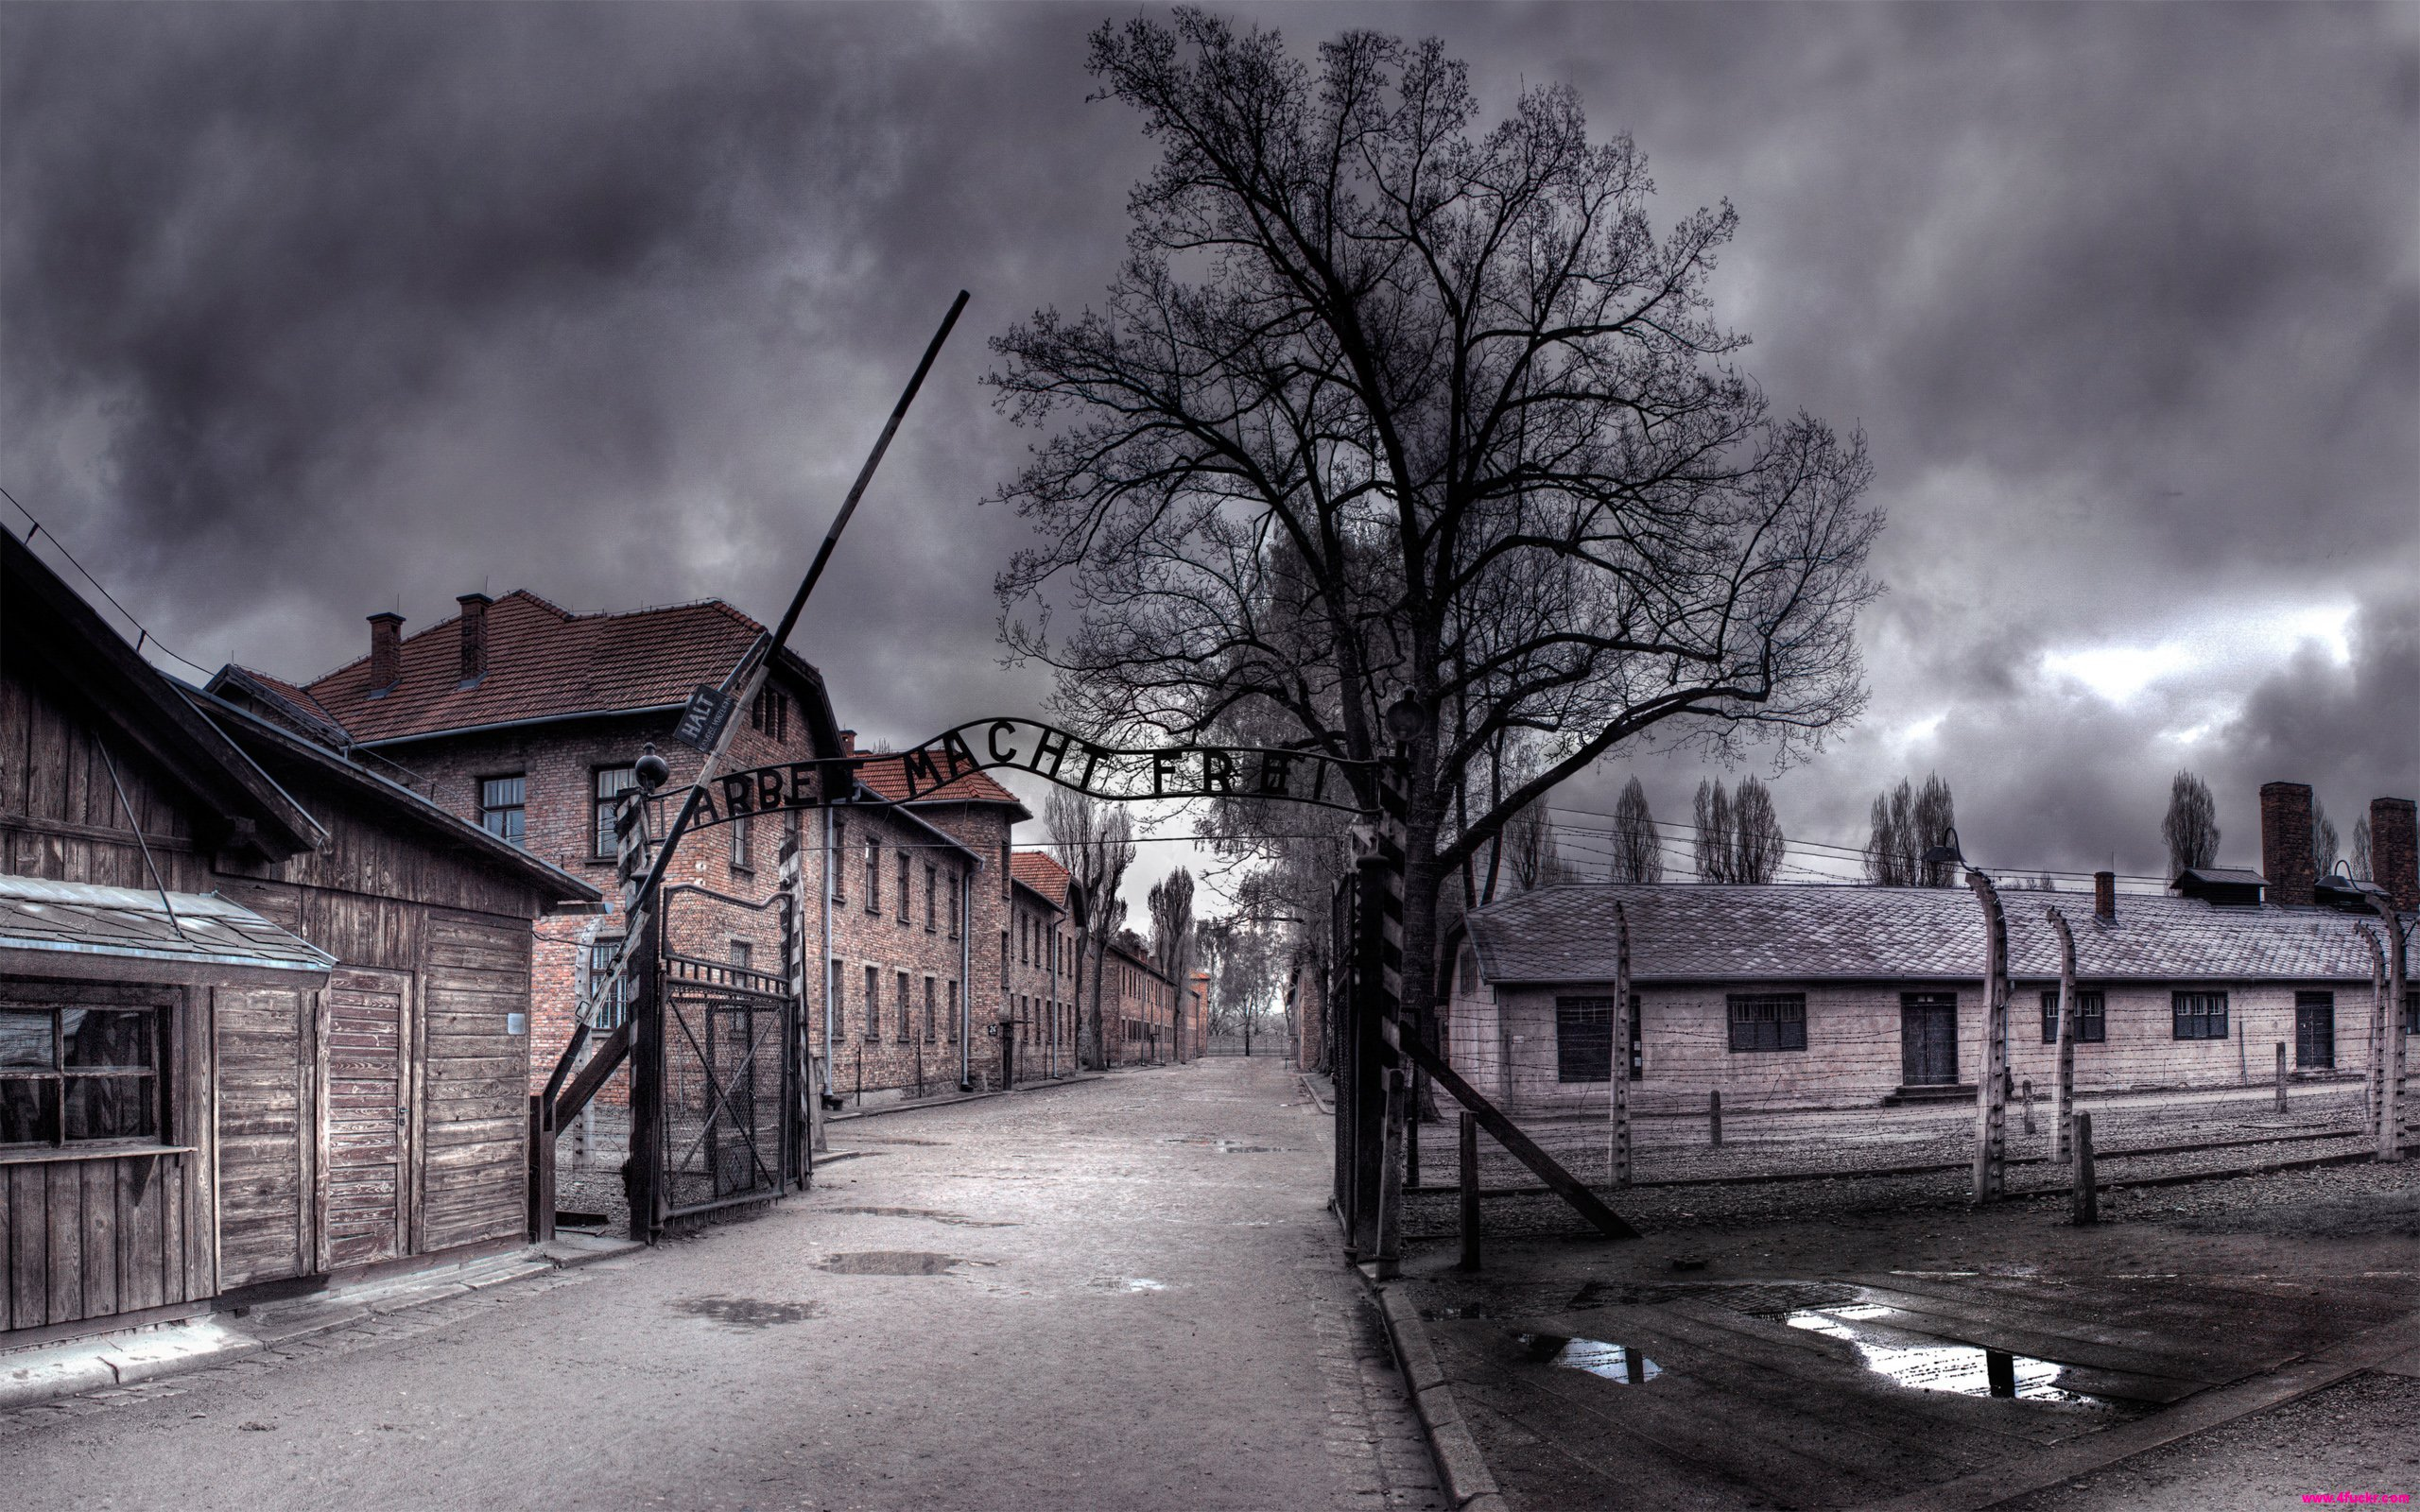 Nazi German Wallpaper 2560x1600 Nazi German Concentration Camp 2560x1600